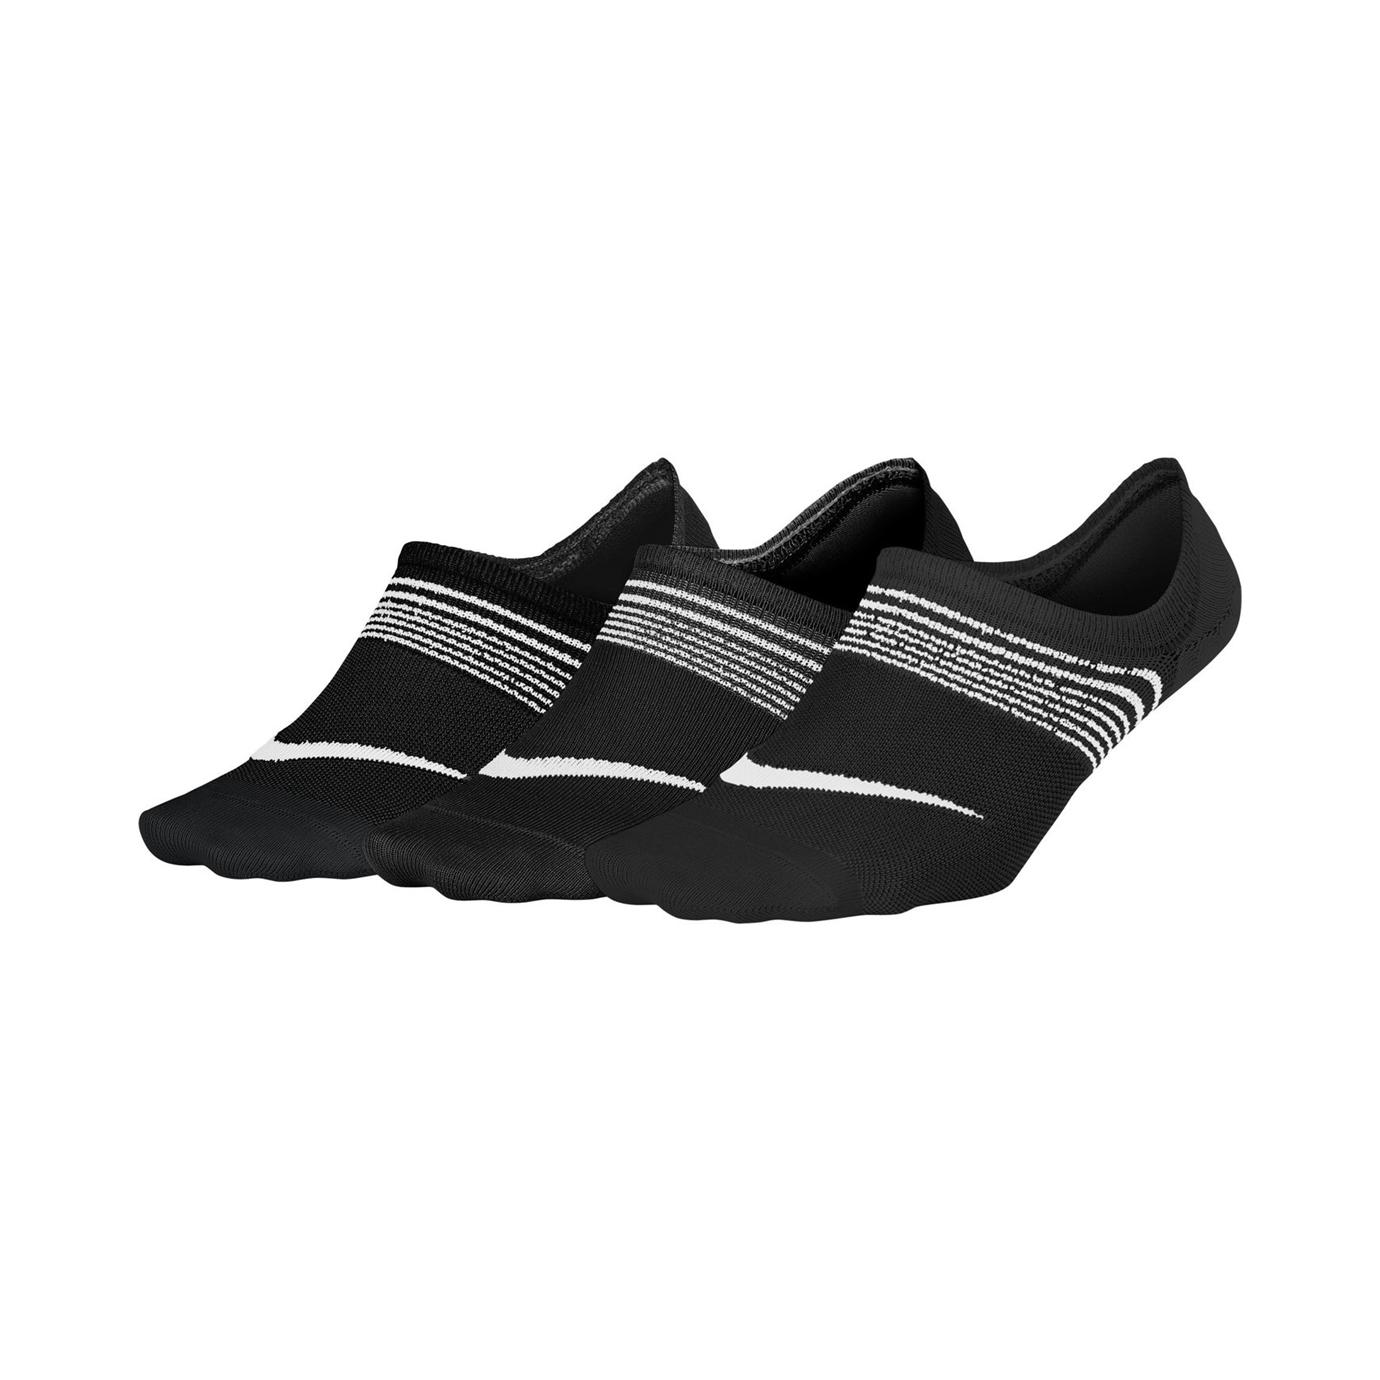 Nike Womens Everyday Plus Lightweight Training Socks 3-pack S (34-38)